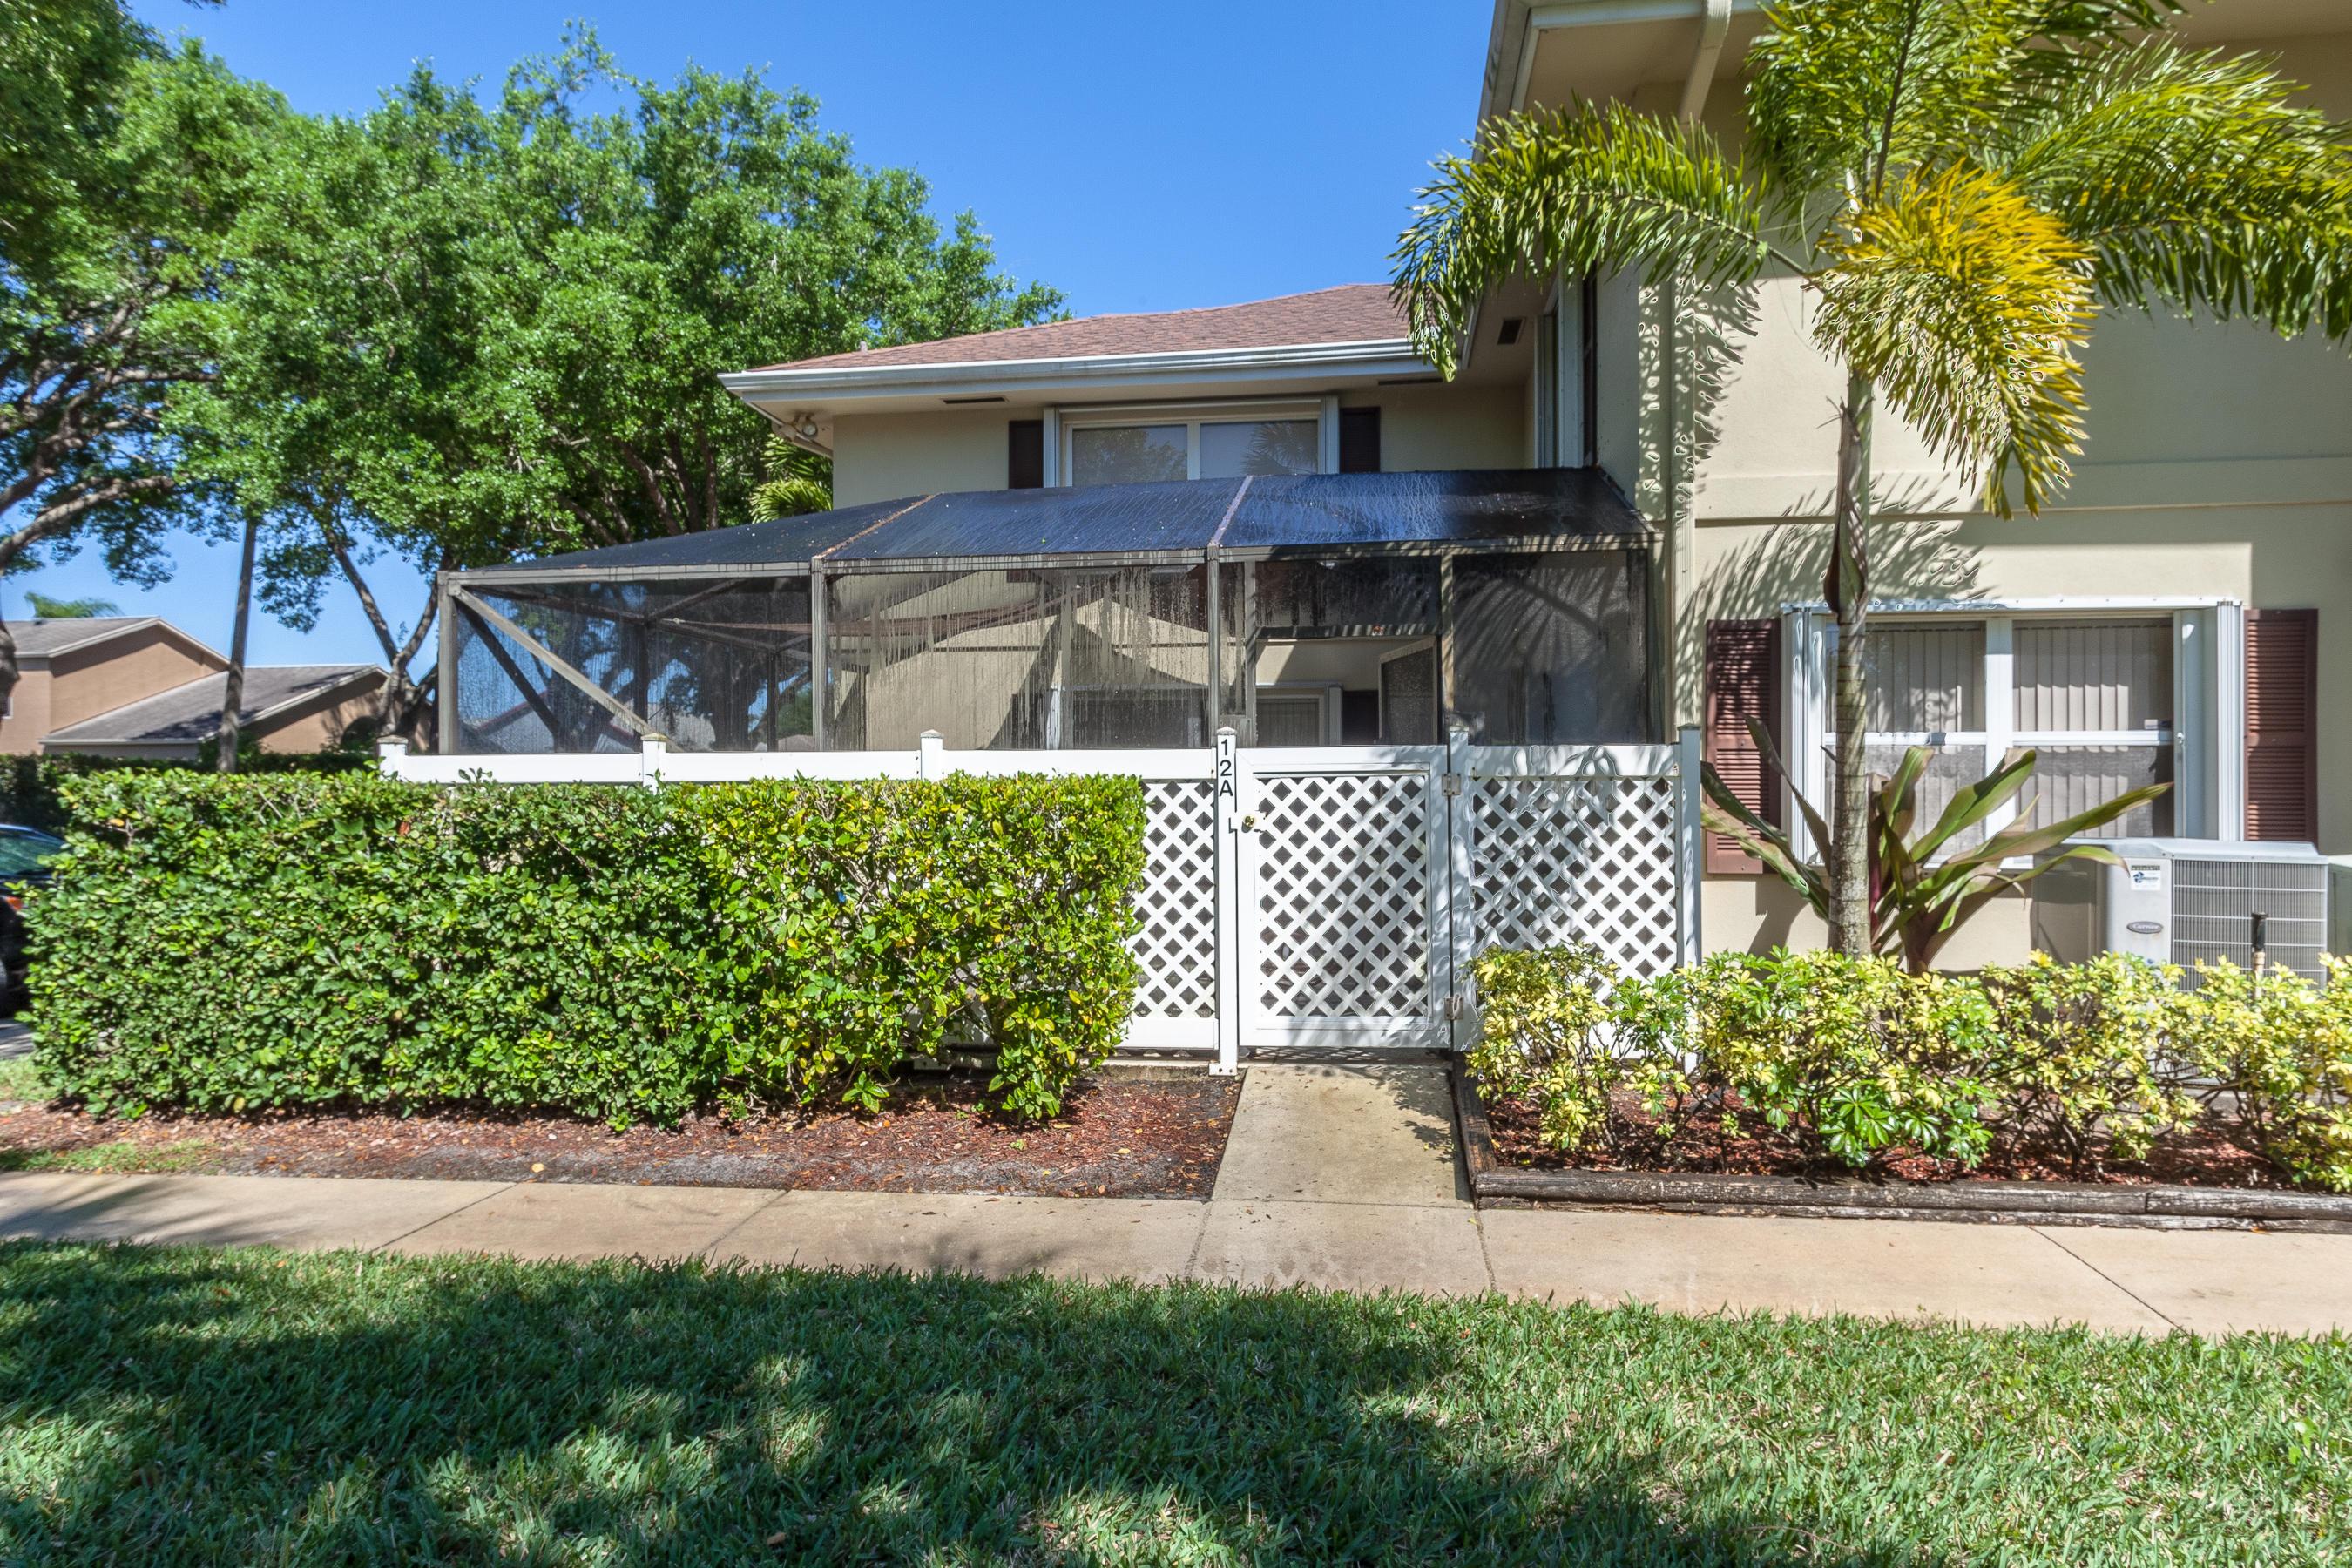 12 Amherst Court, Royal Palm Beach, FL 33411